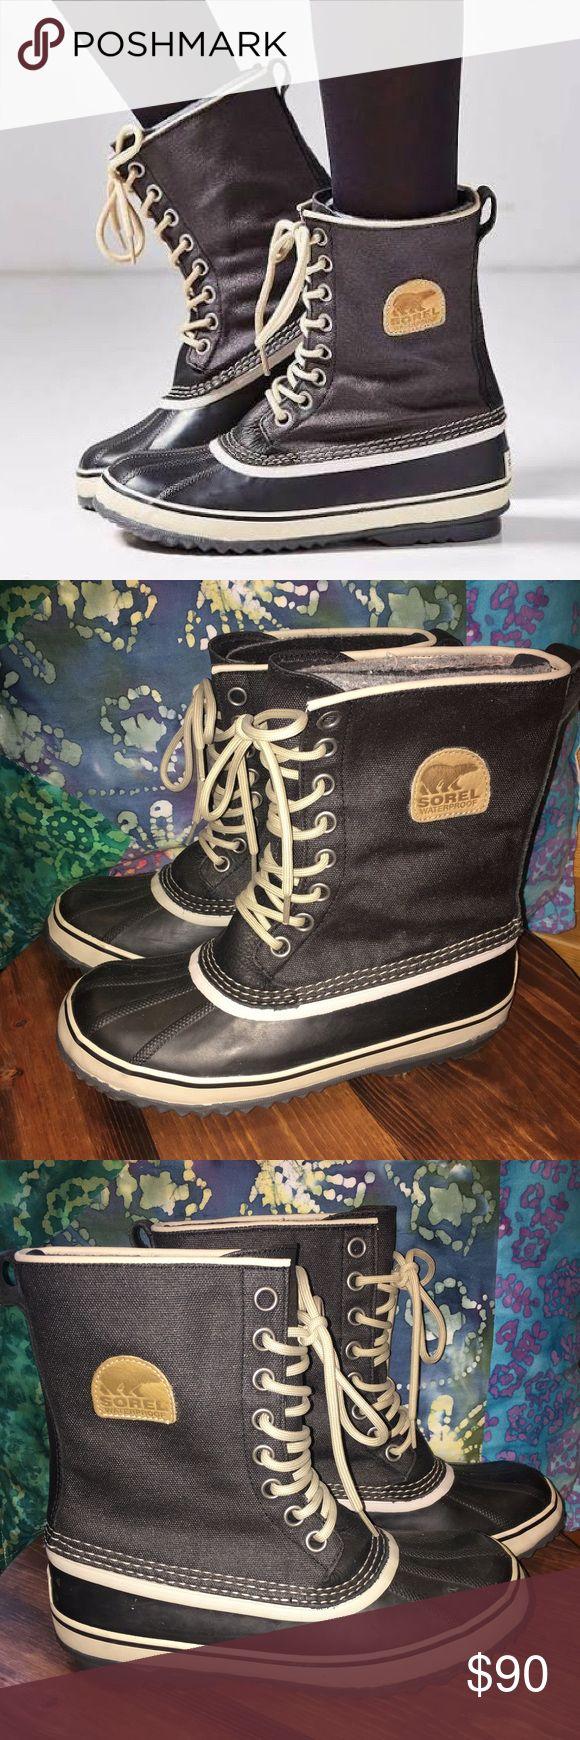 best 25 rubber duck boots ideas on spring photos - Duck Rain Boots